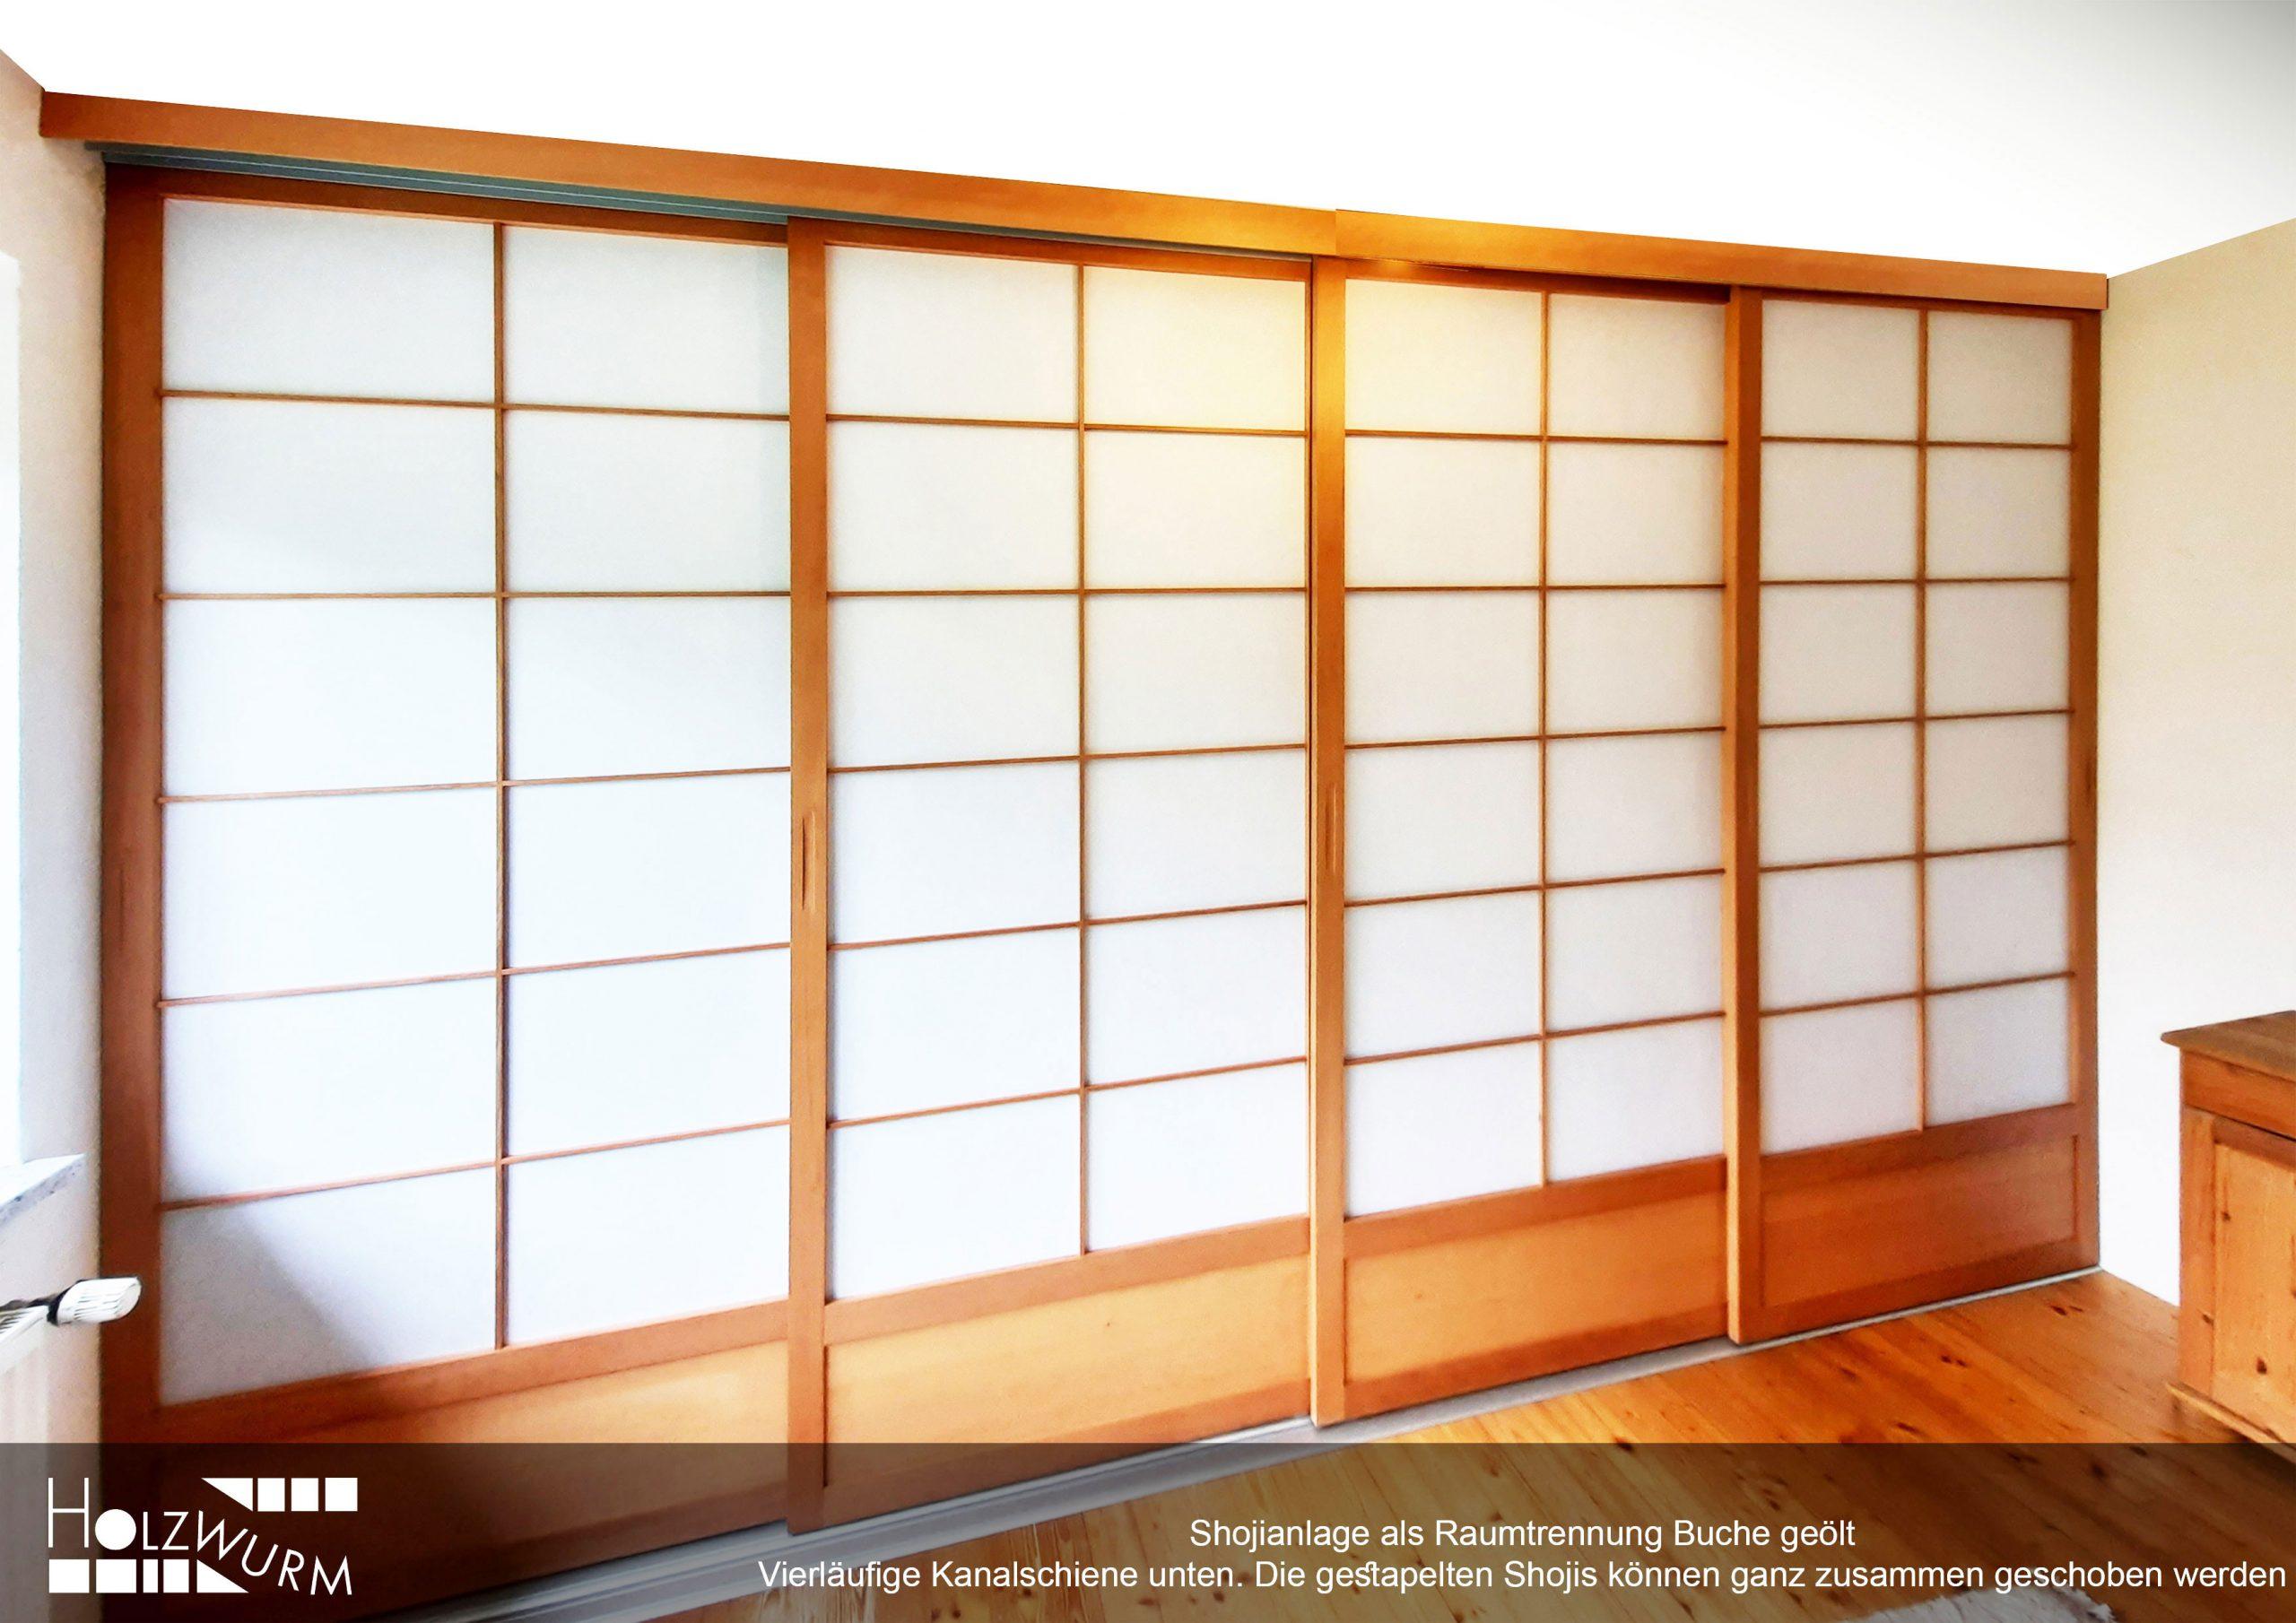 Shoji Raumtrennung Buche vier Laufkanäle